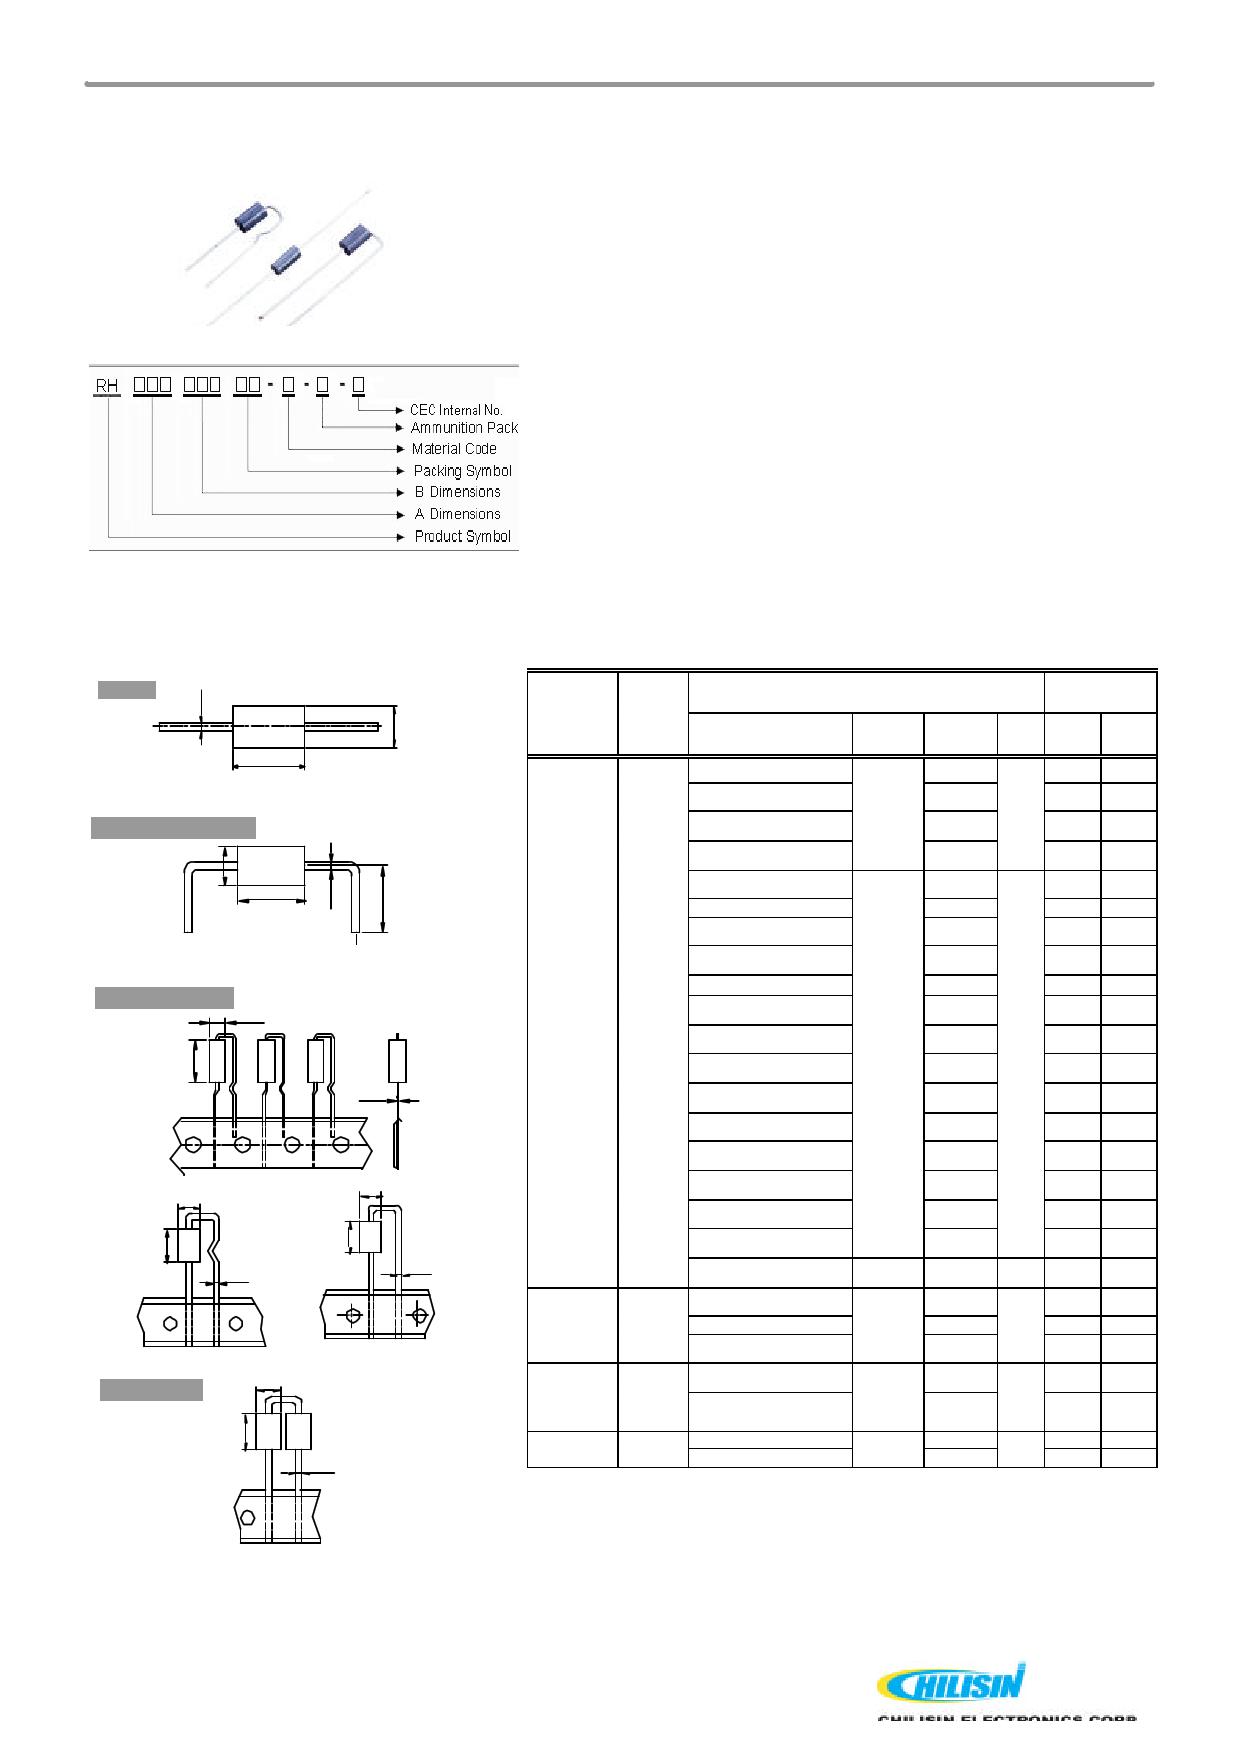 RH02503 데이터시트 및 RH02503 PDF